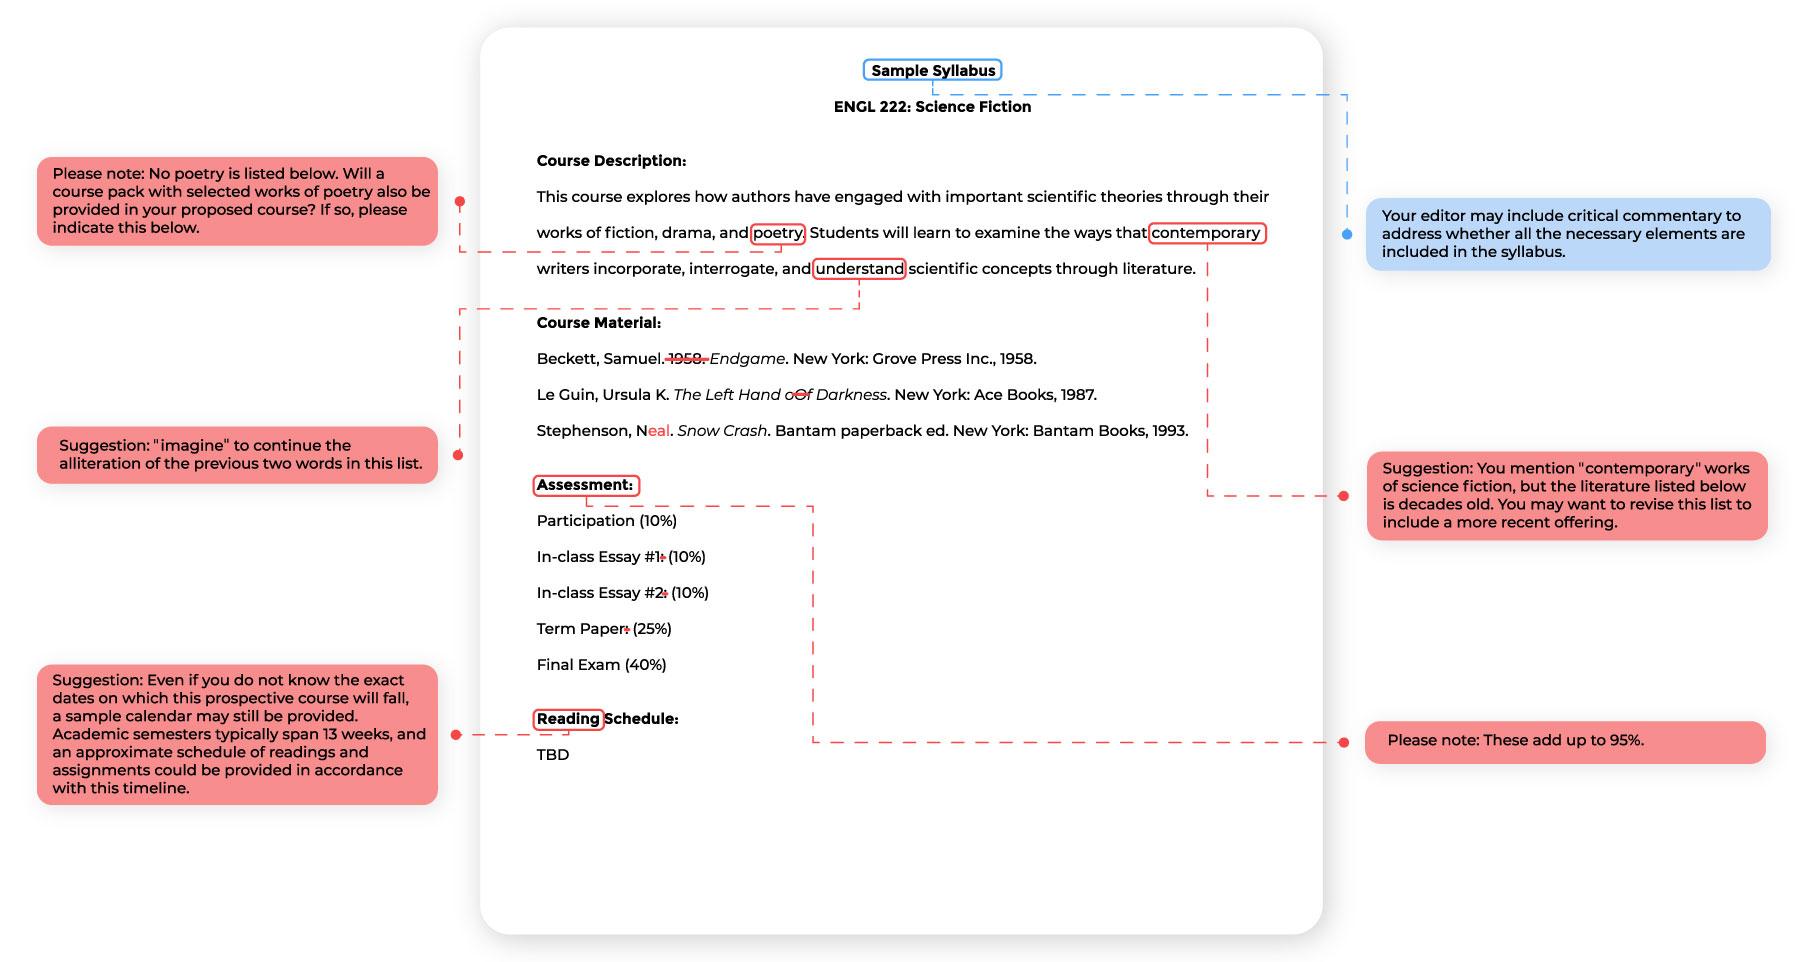 Syllabus Editing Sample